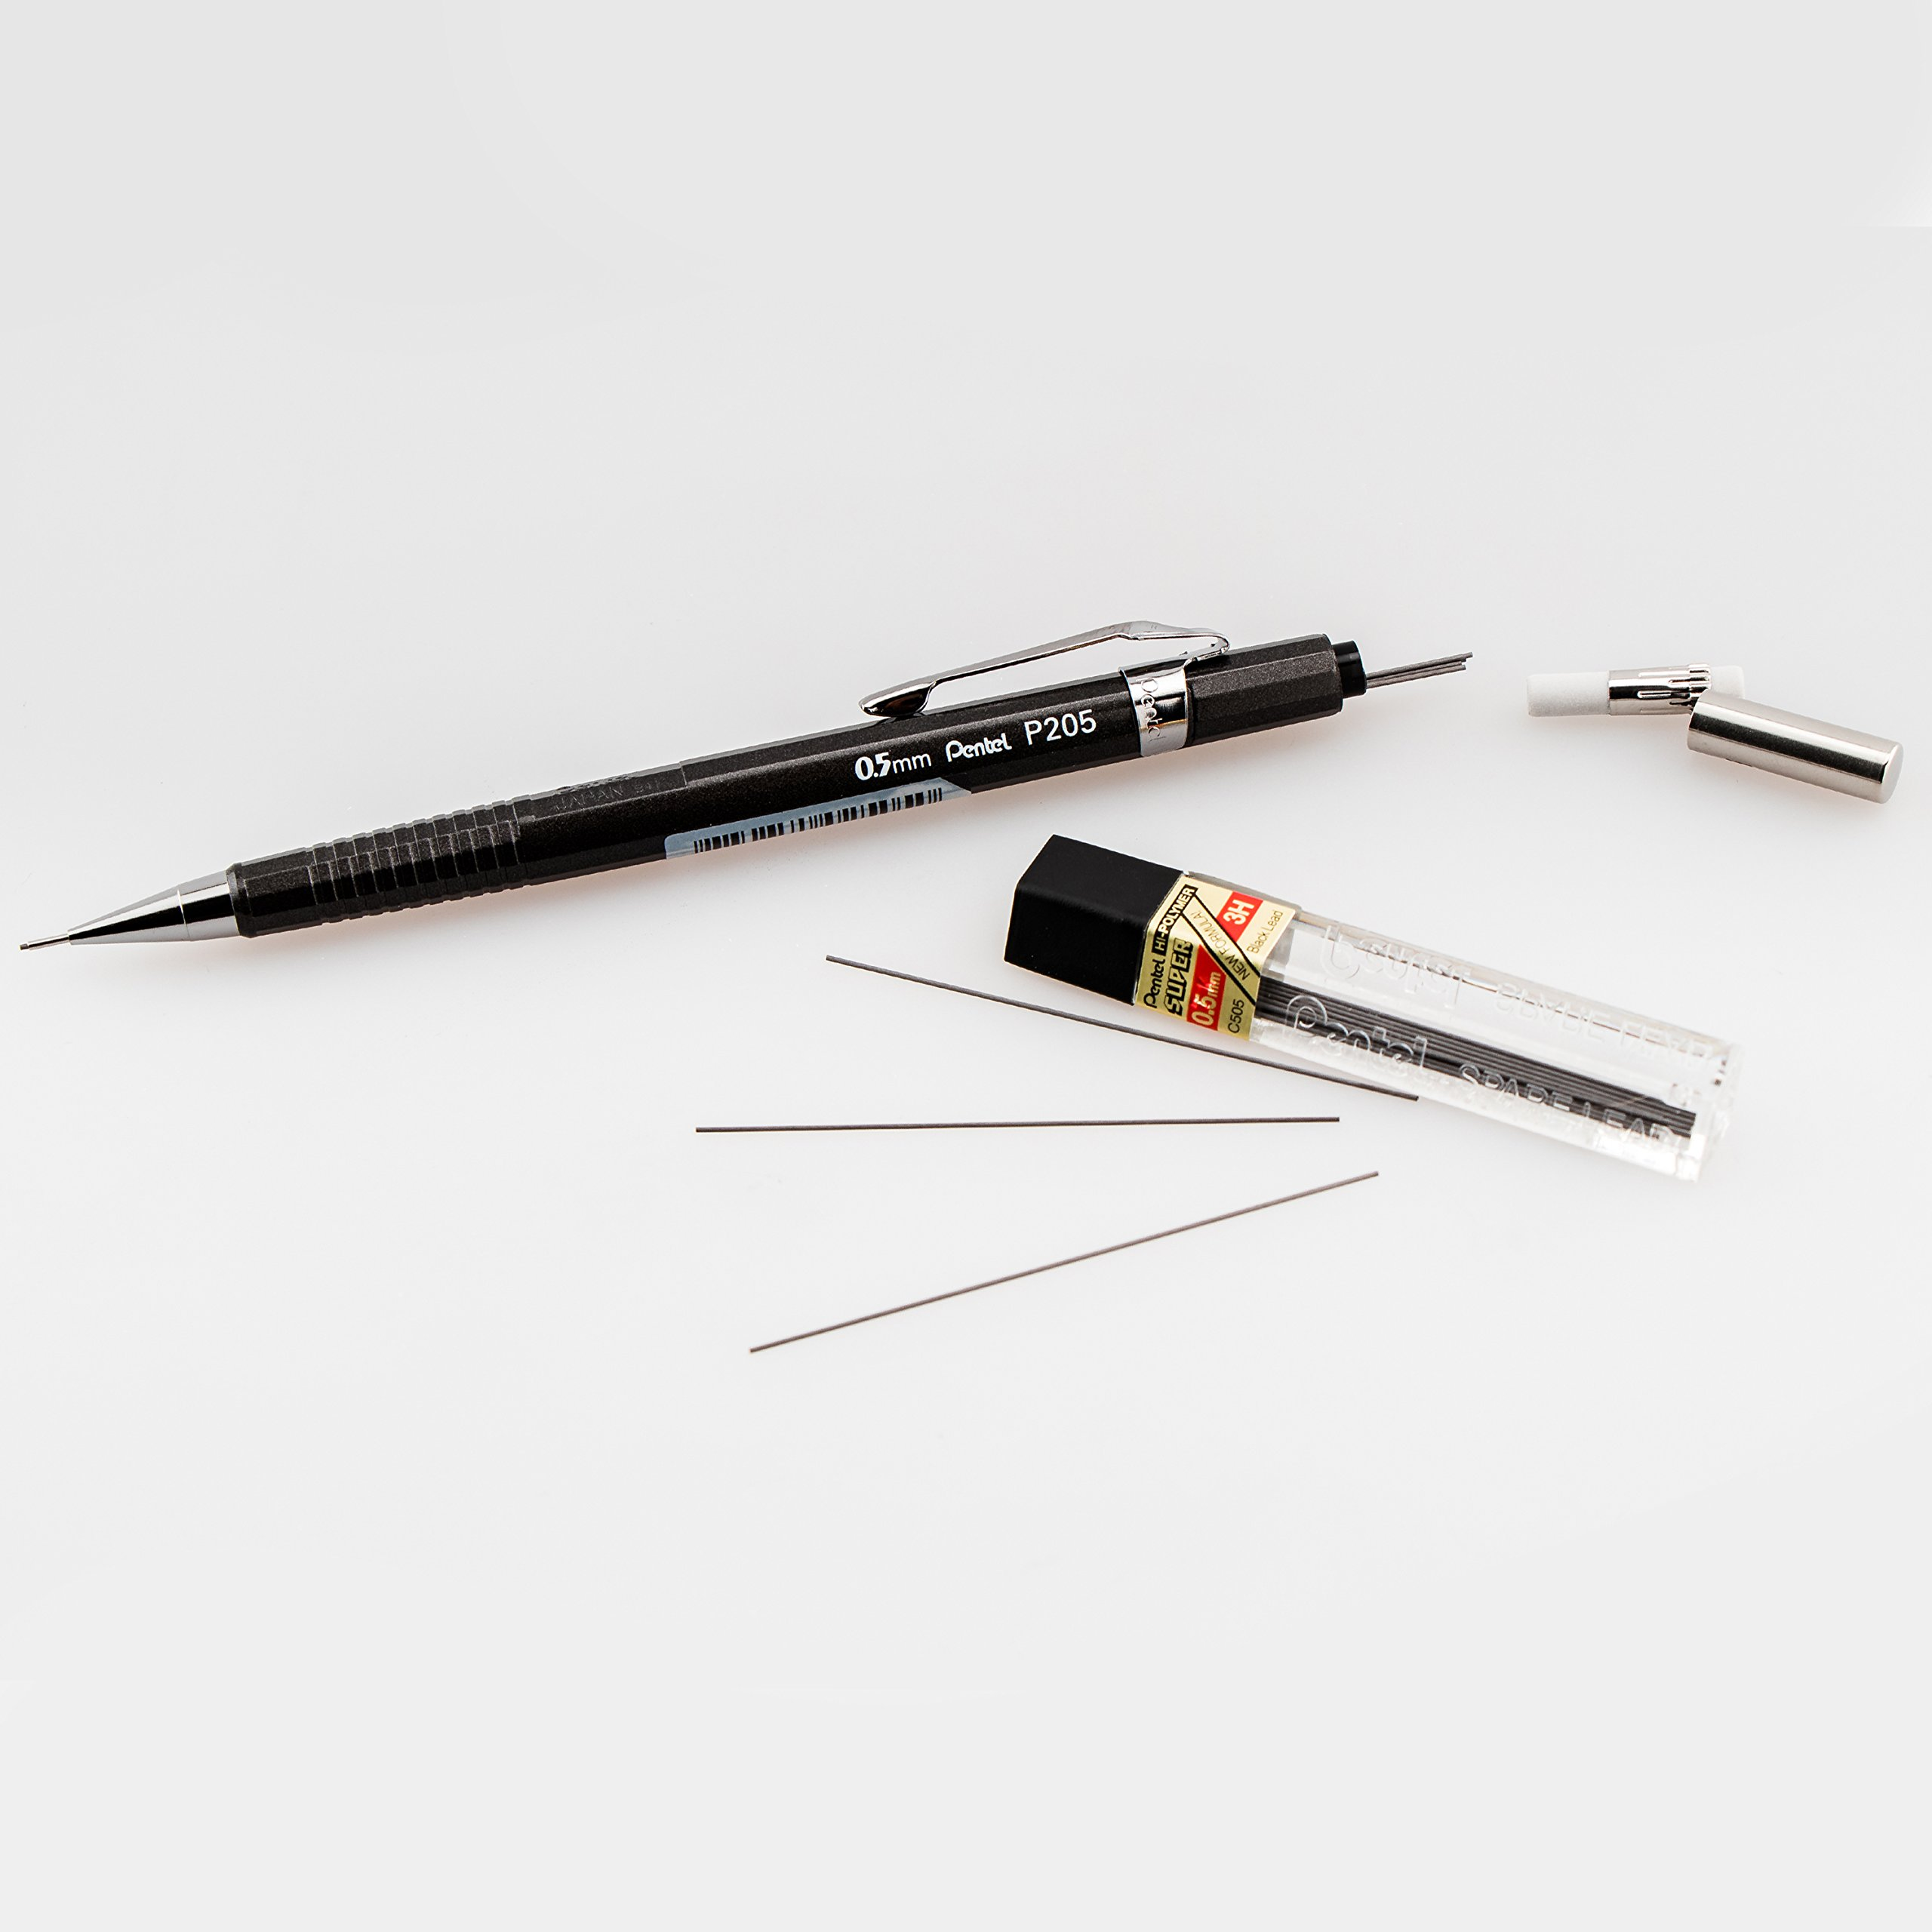 Pentel Sharp Automatic Pencil by Pentel (Image #6)